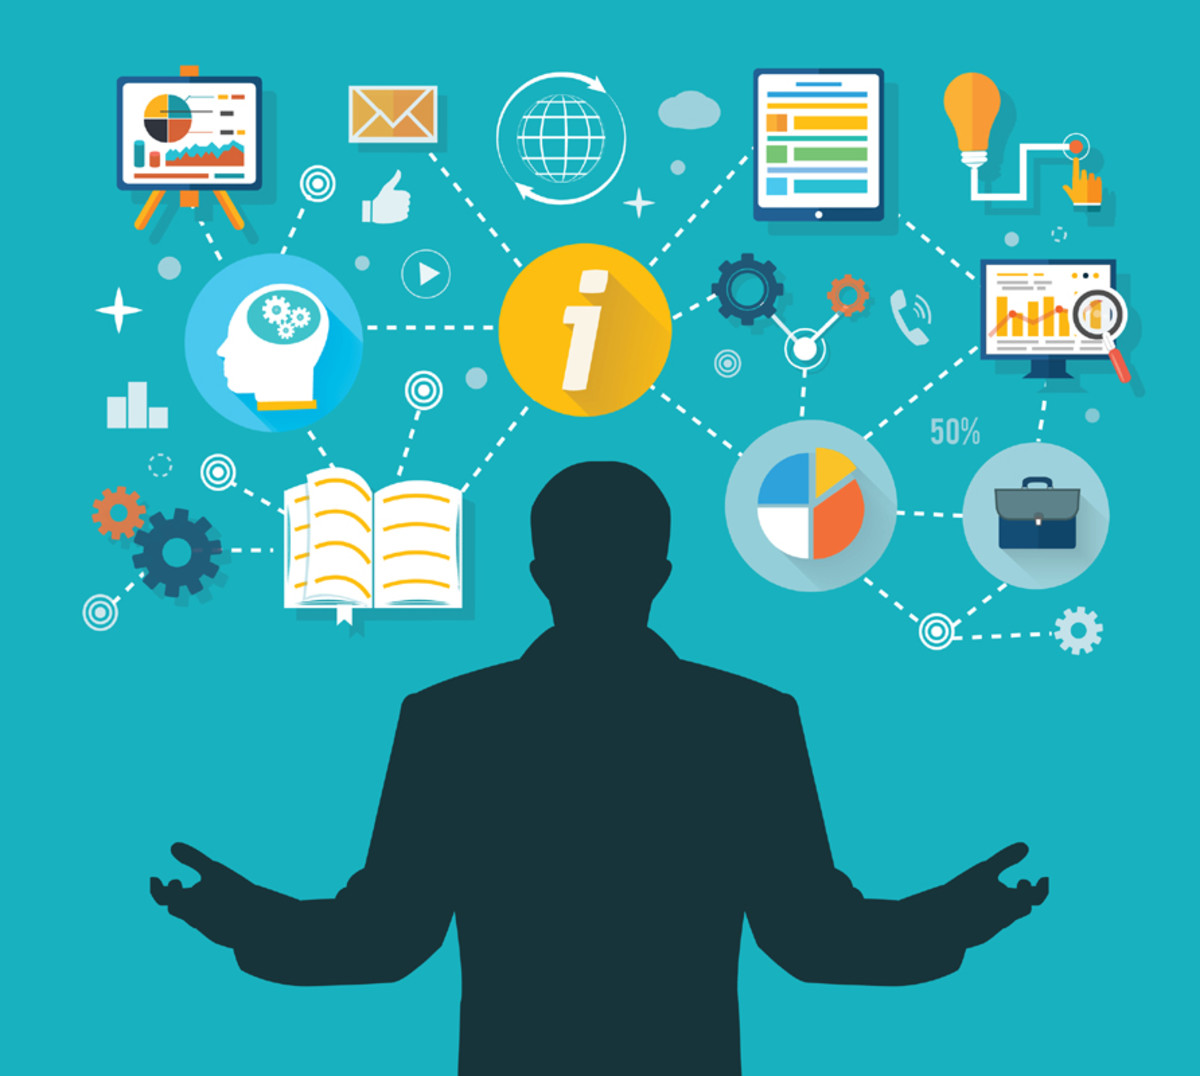 4-characteristics-of-successful-entrepreneurs